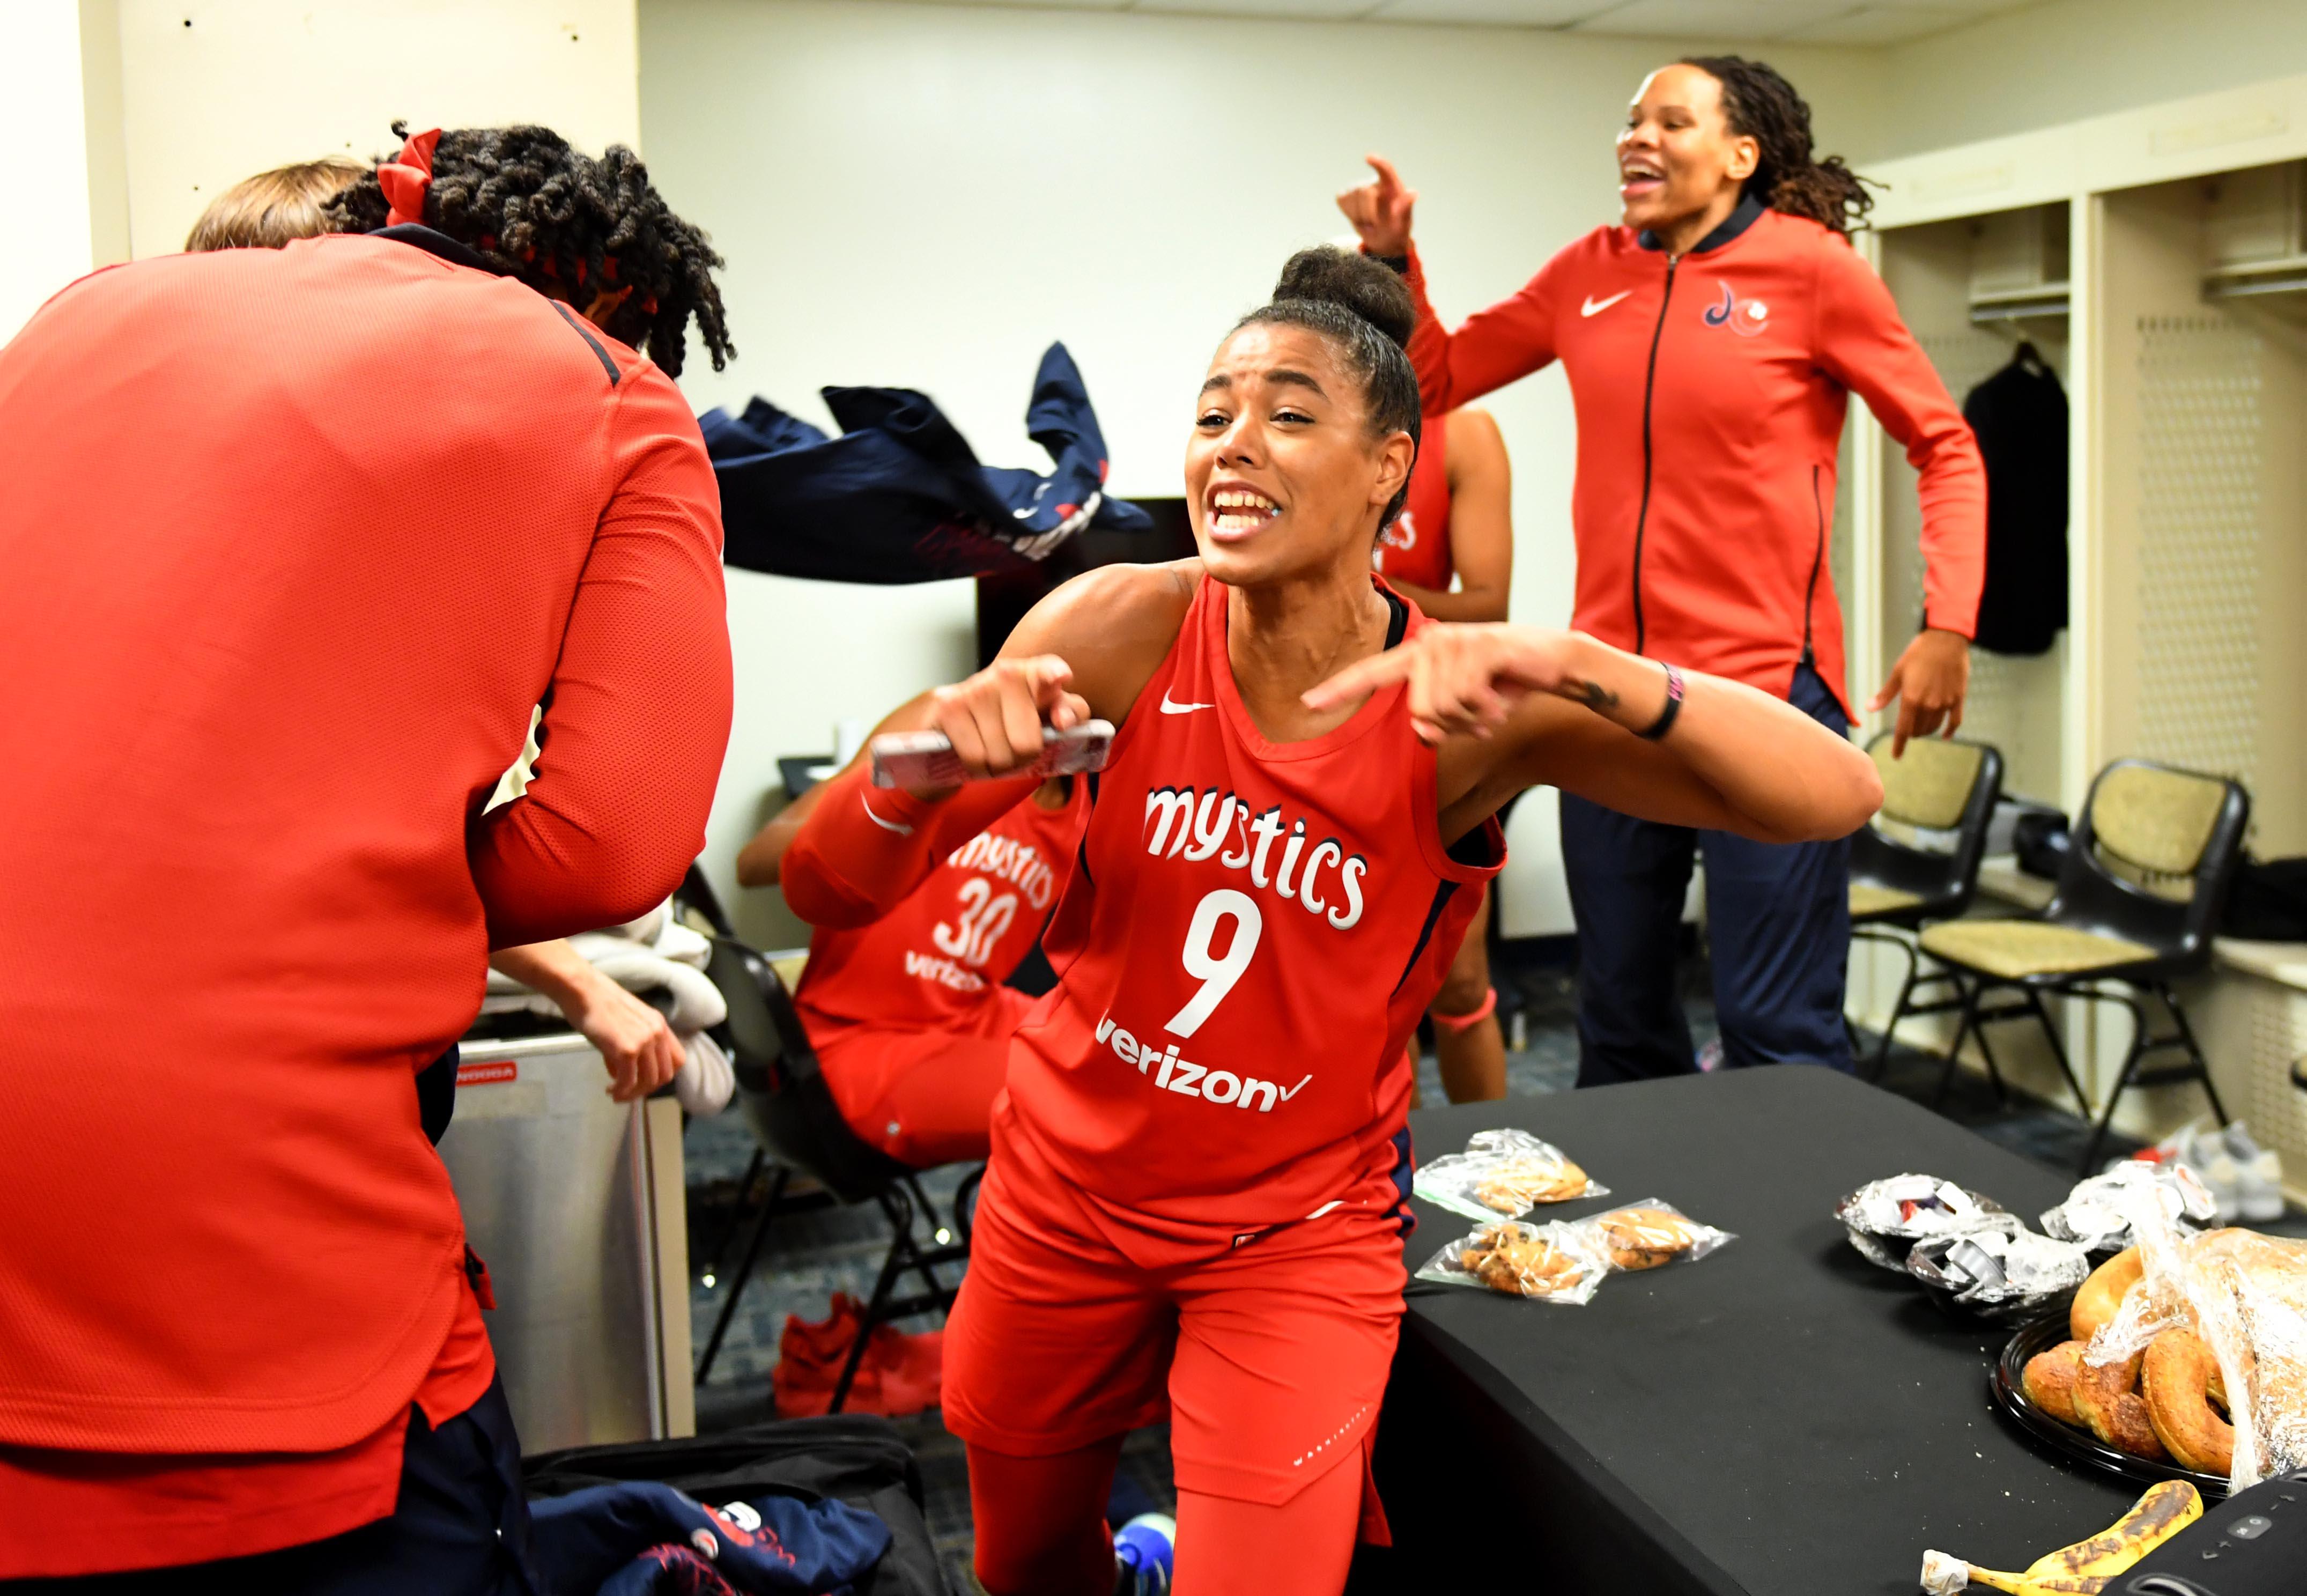 WNBA conference finals game 5 - Washington Mystics play Atlanta Dream